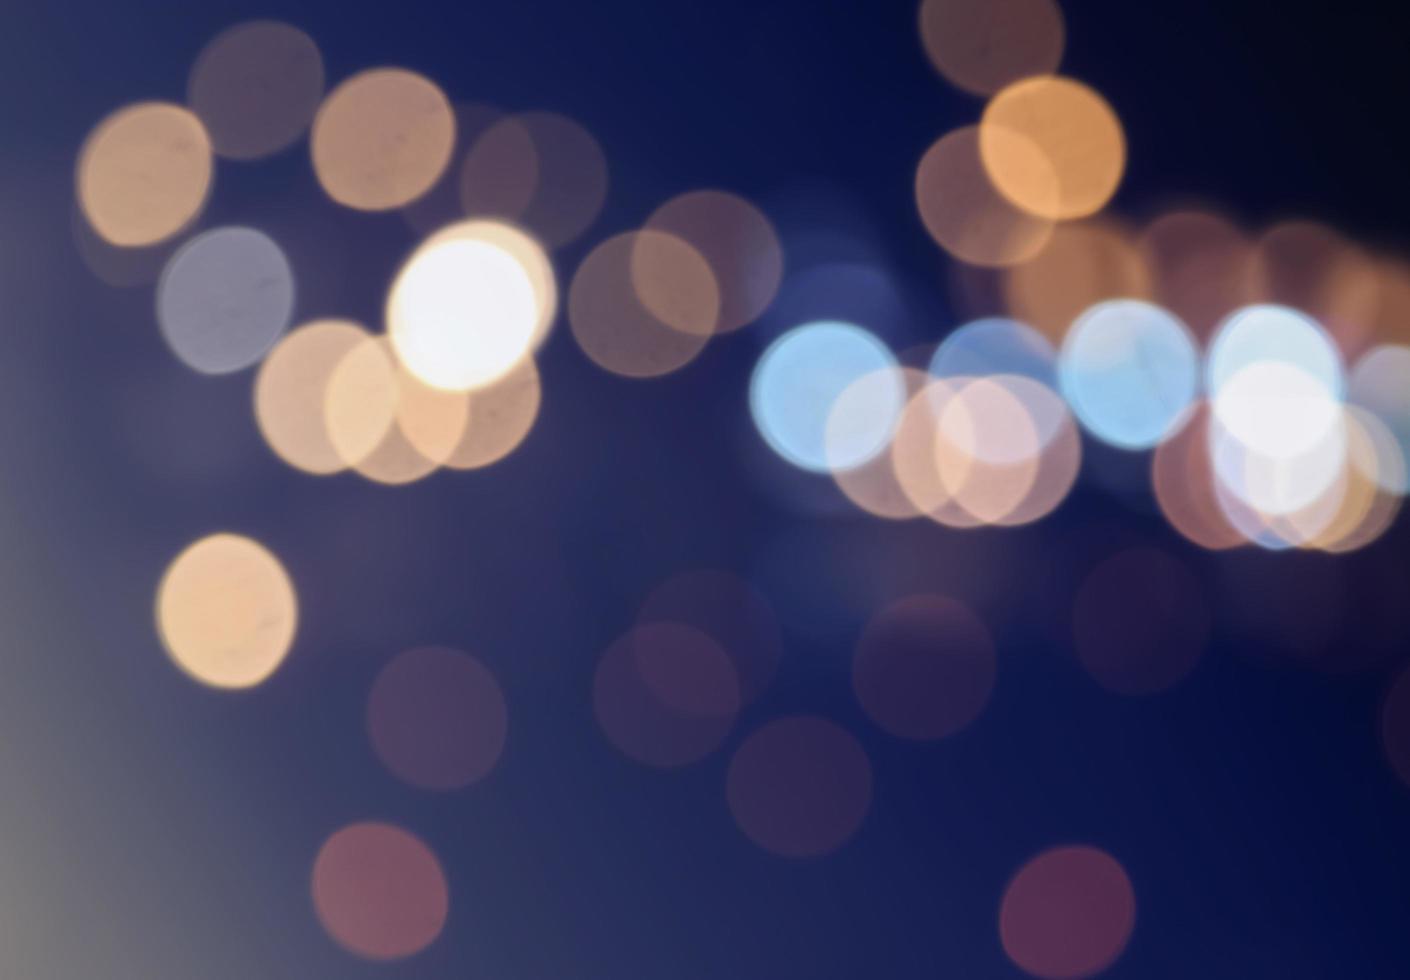 mjuka fokus bokeh-lampor foto